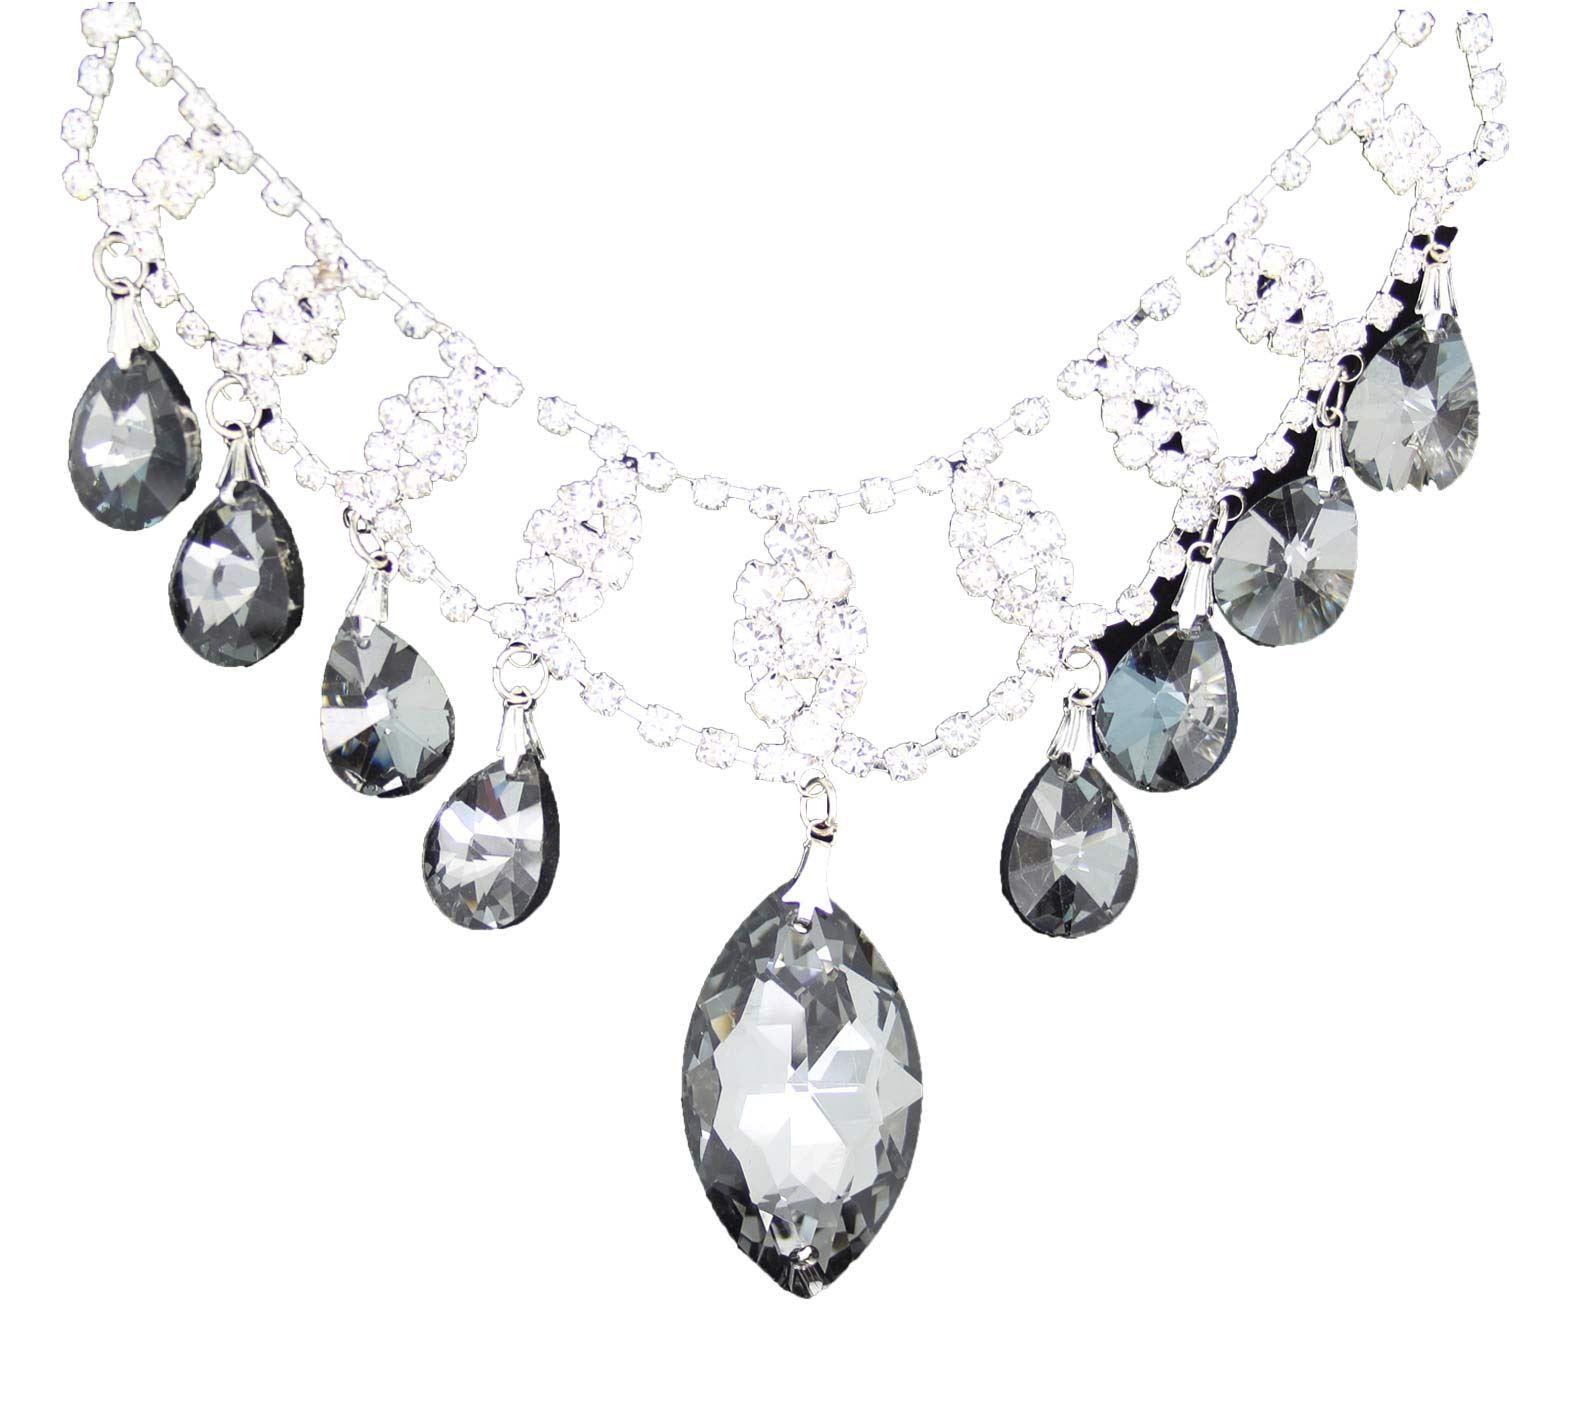 True-Face-Ladies-Women-039-s-Elegant-Earrings-Necklace-Set-Metal-Alloy-Jewellery thumbnail 4